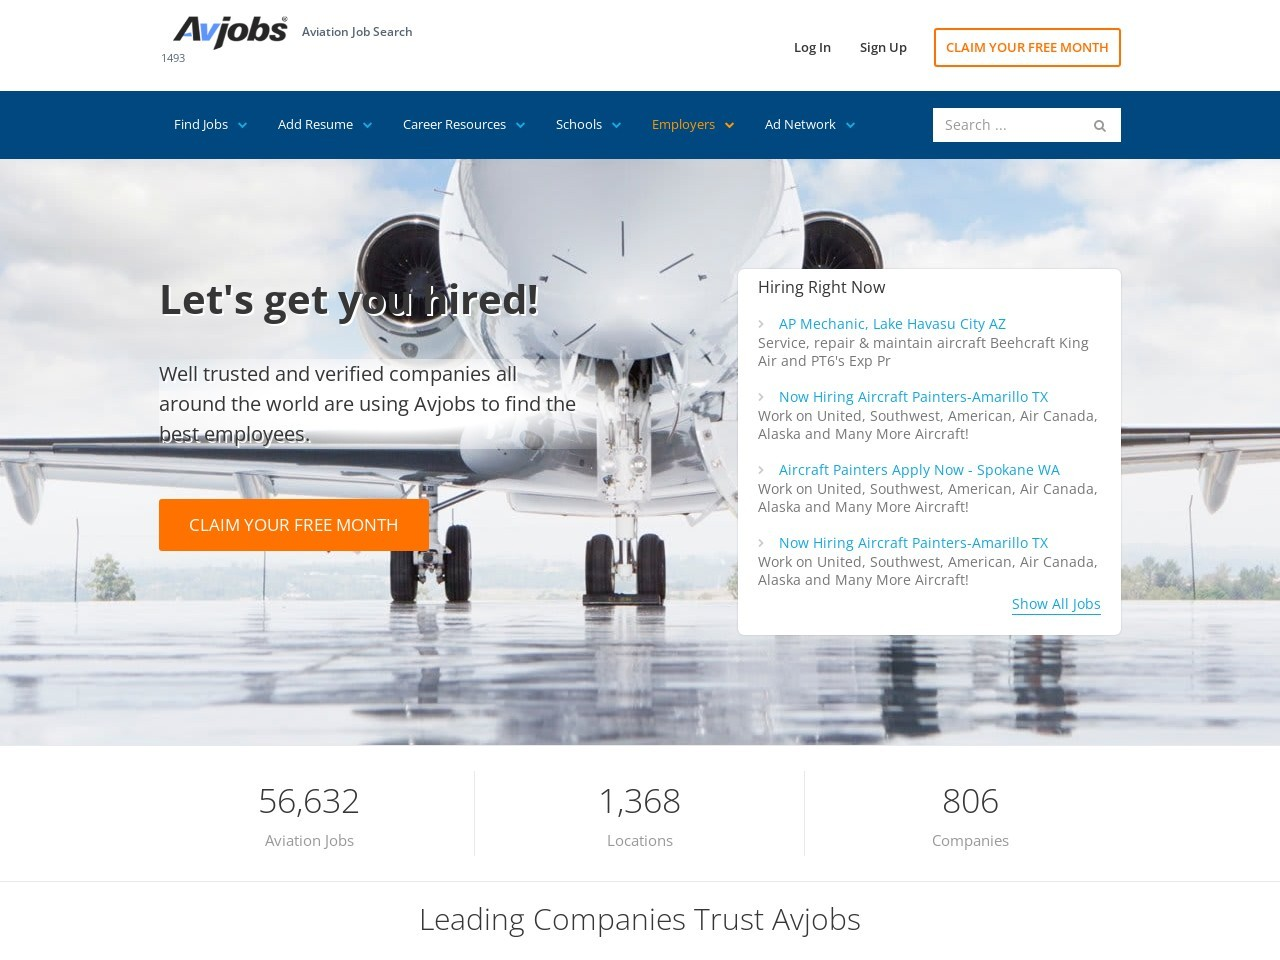 Maintenance Job At Inertial Aerospace Services - Aircraft Avionics Tec